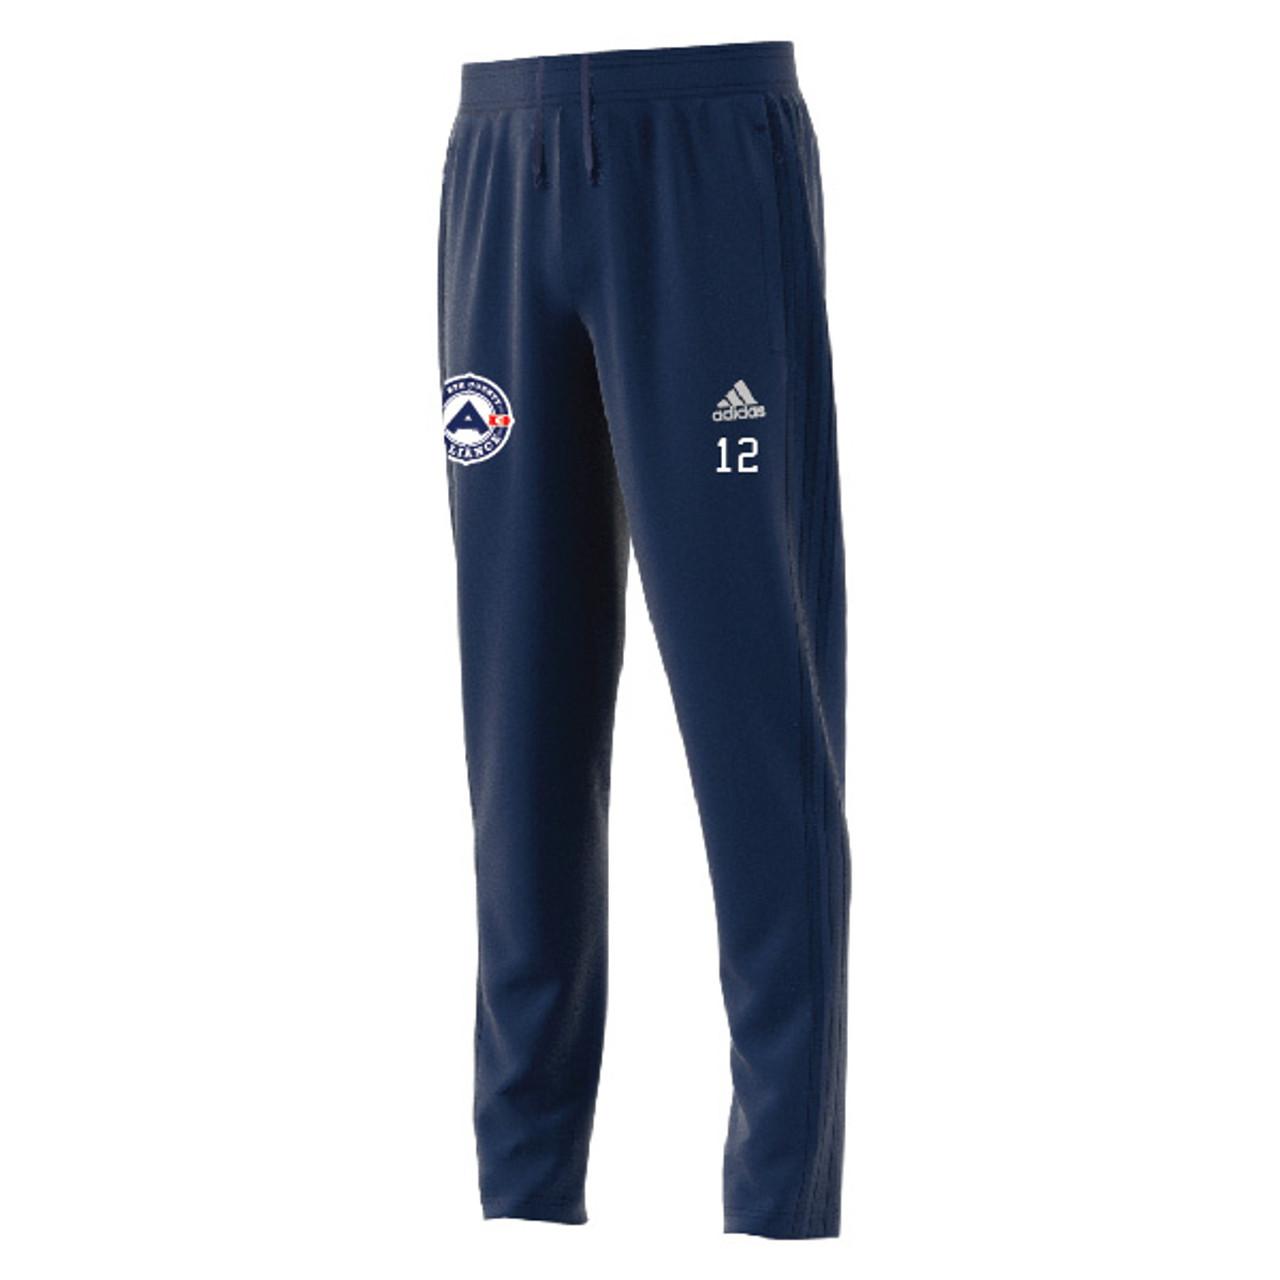 900527700310 adidas Condivo 18 Training Pants (NCA) - Soccer City